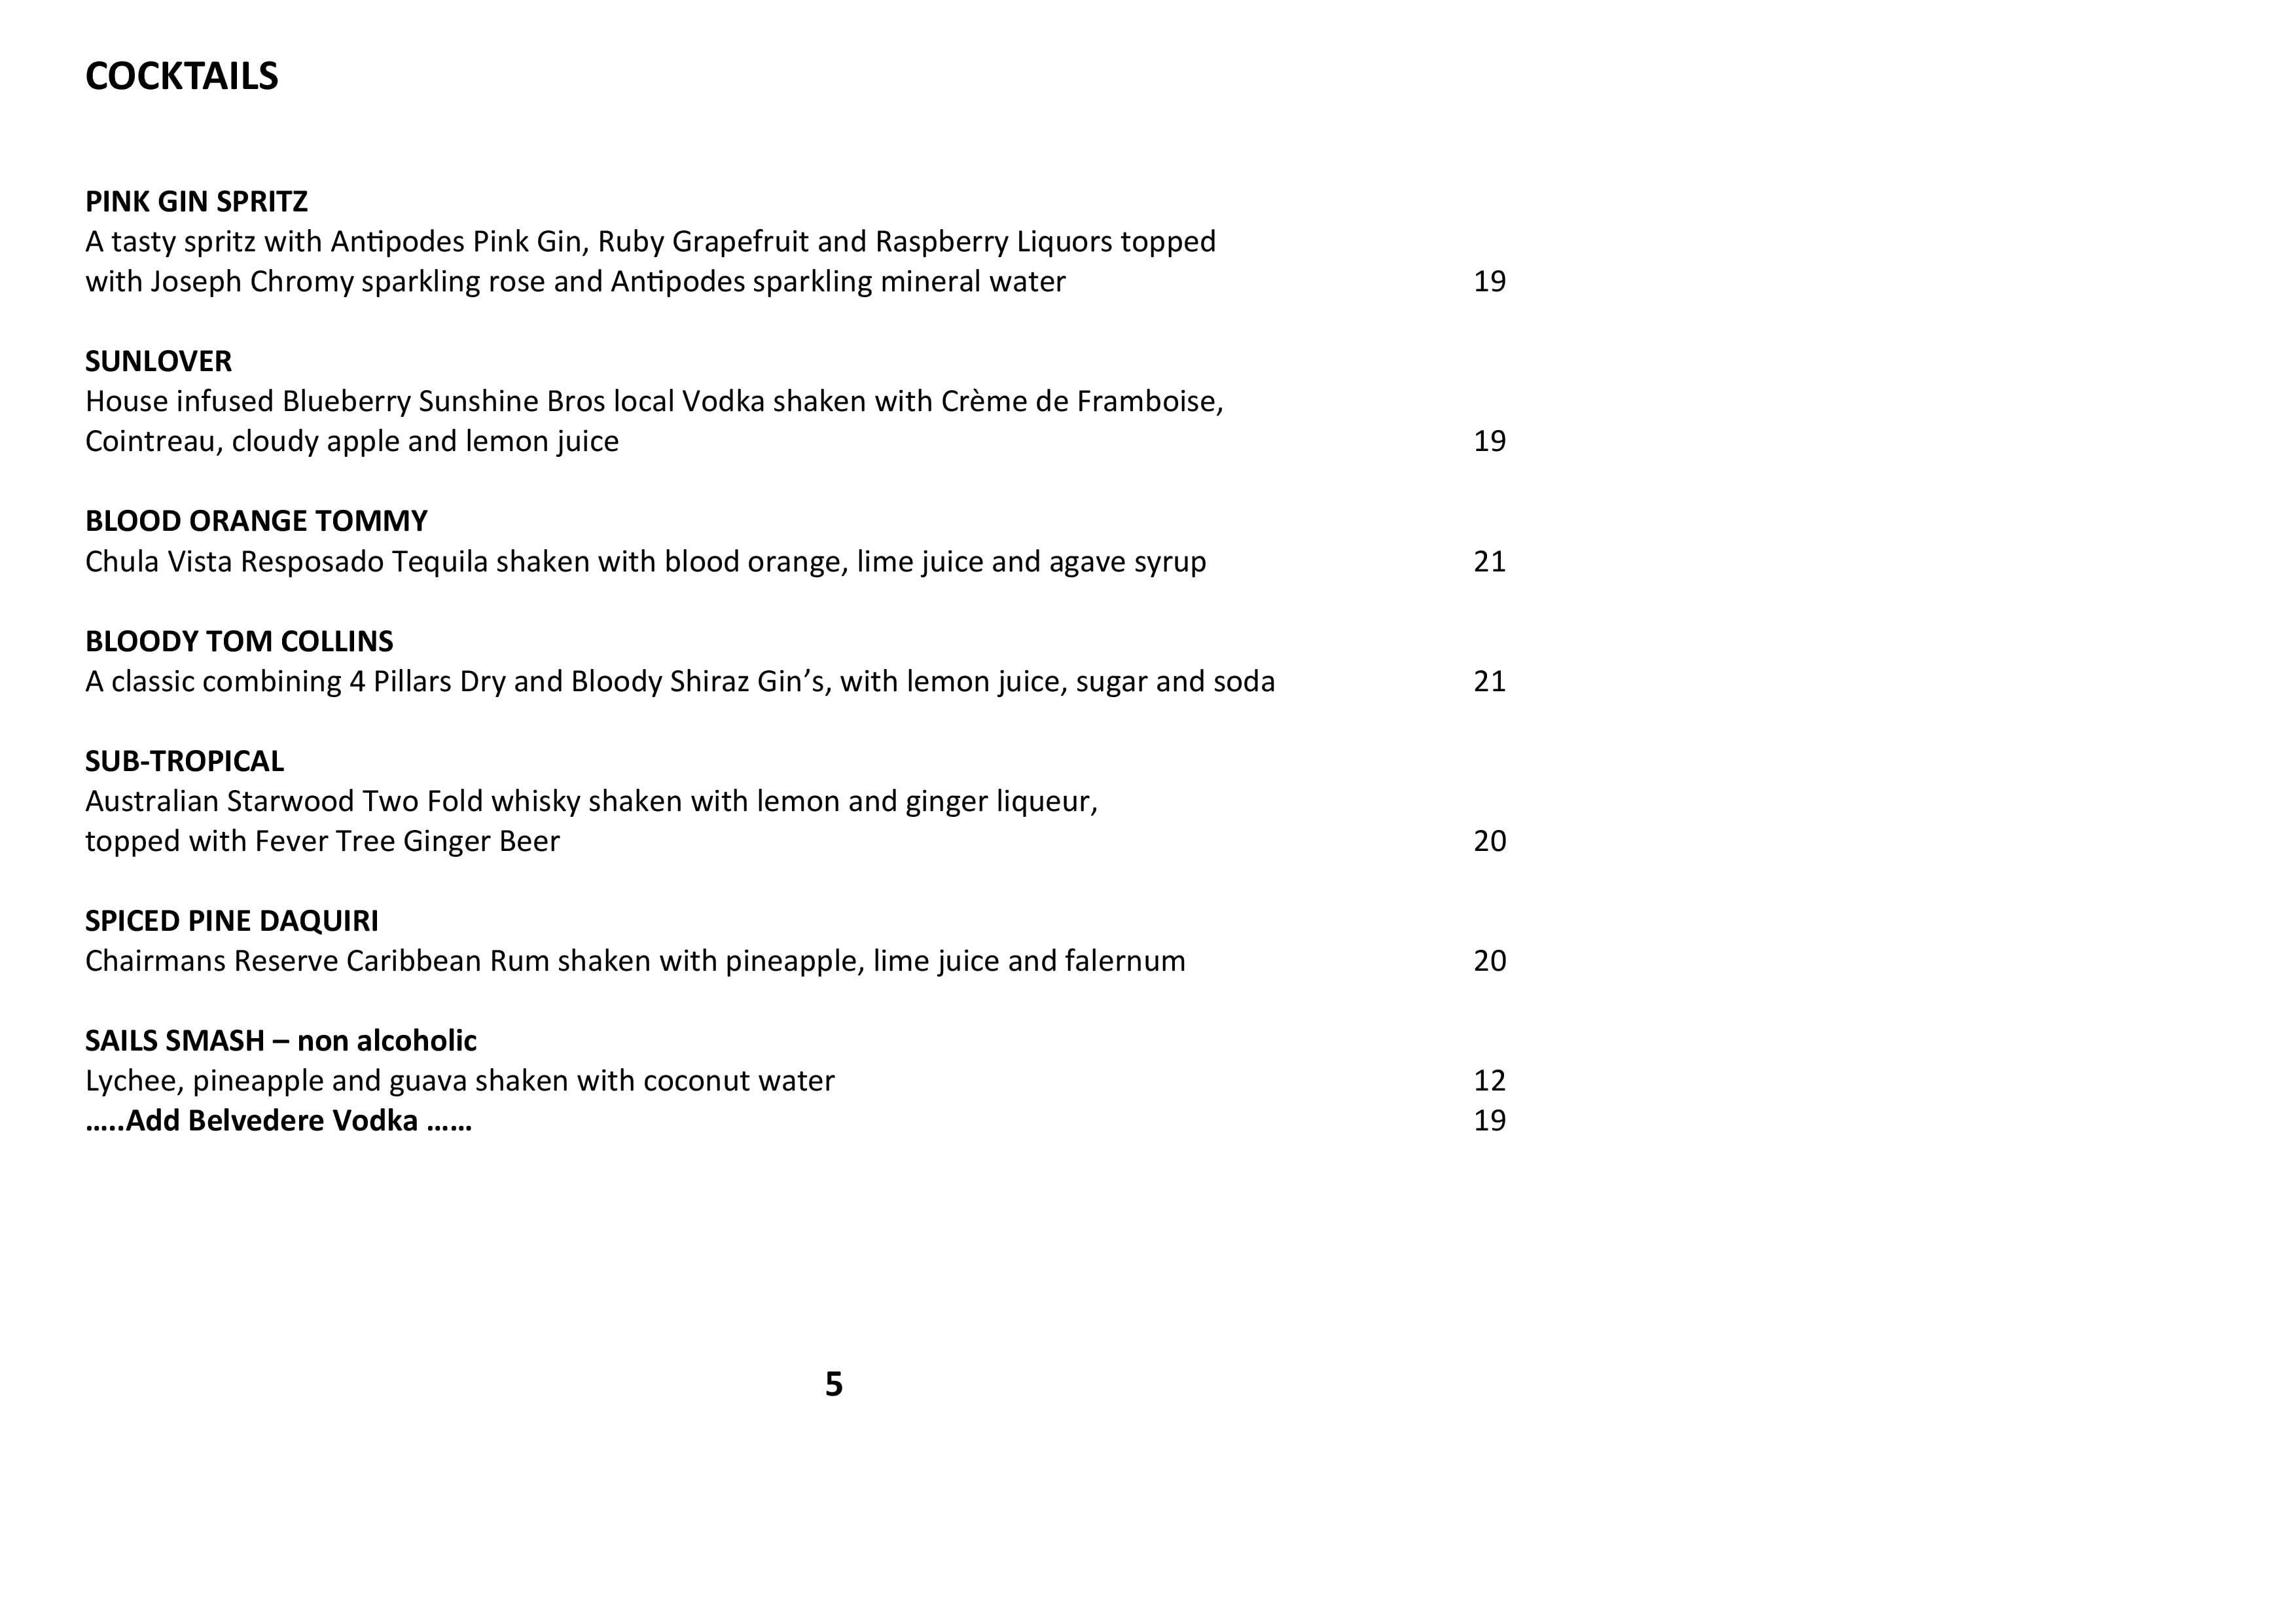 Sails Wine List 2021 Page 005